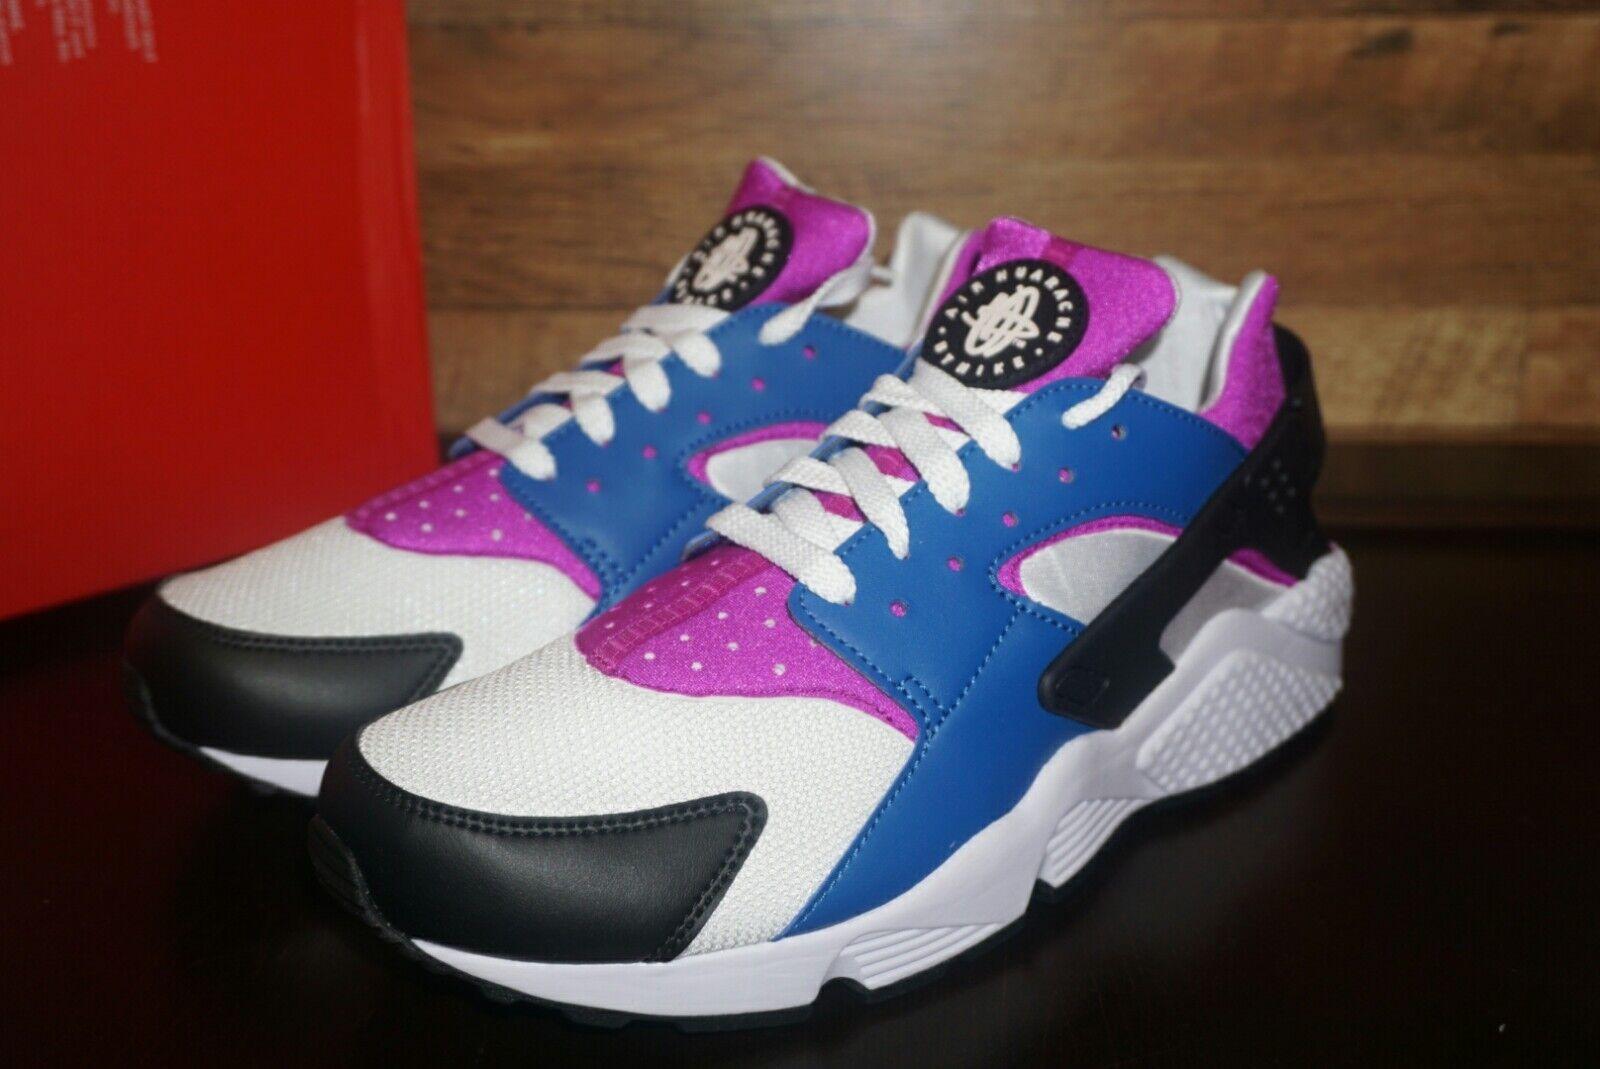 Nike air huarache 318429-415 blue jay nuova dimensione Uomo retrò colorway